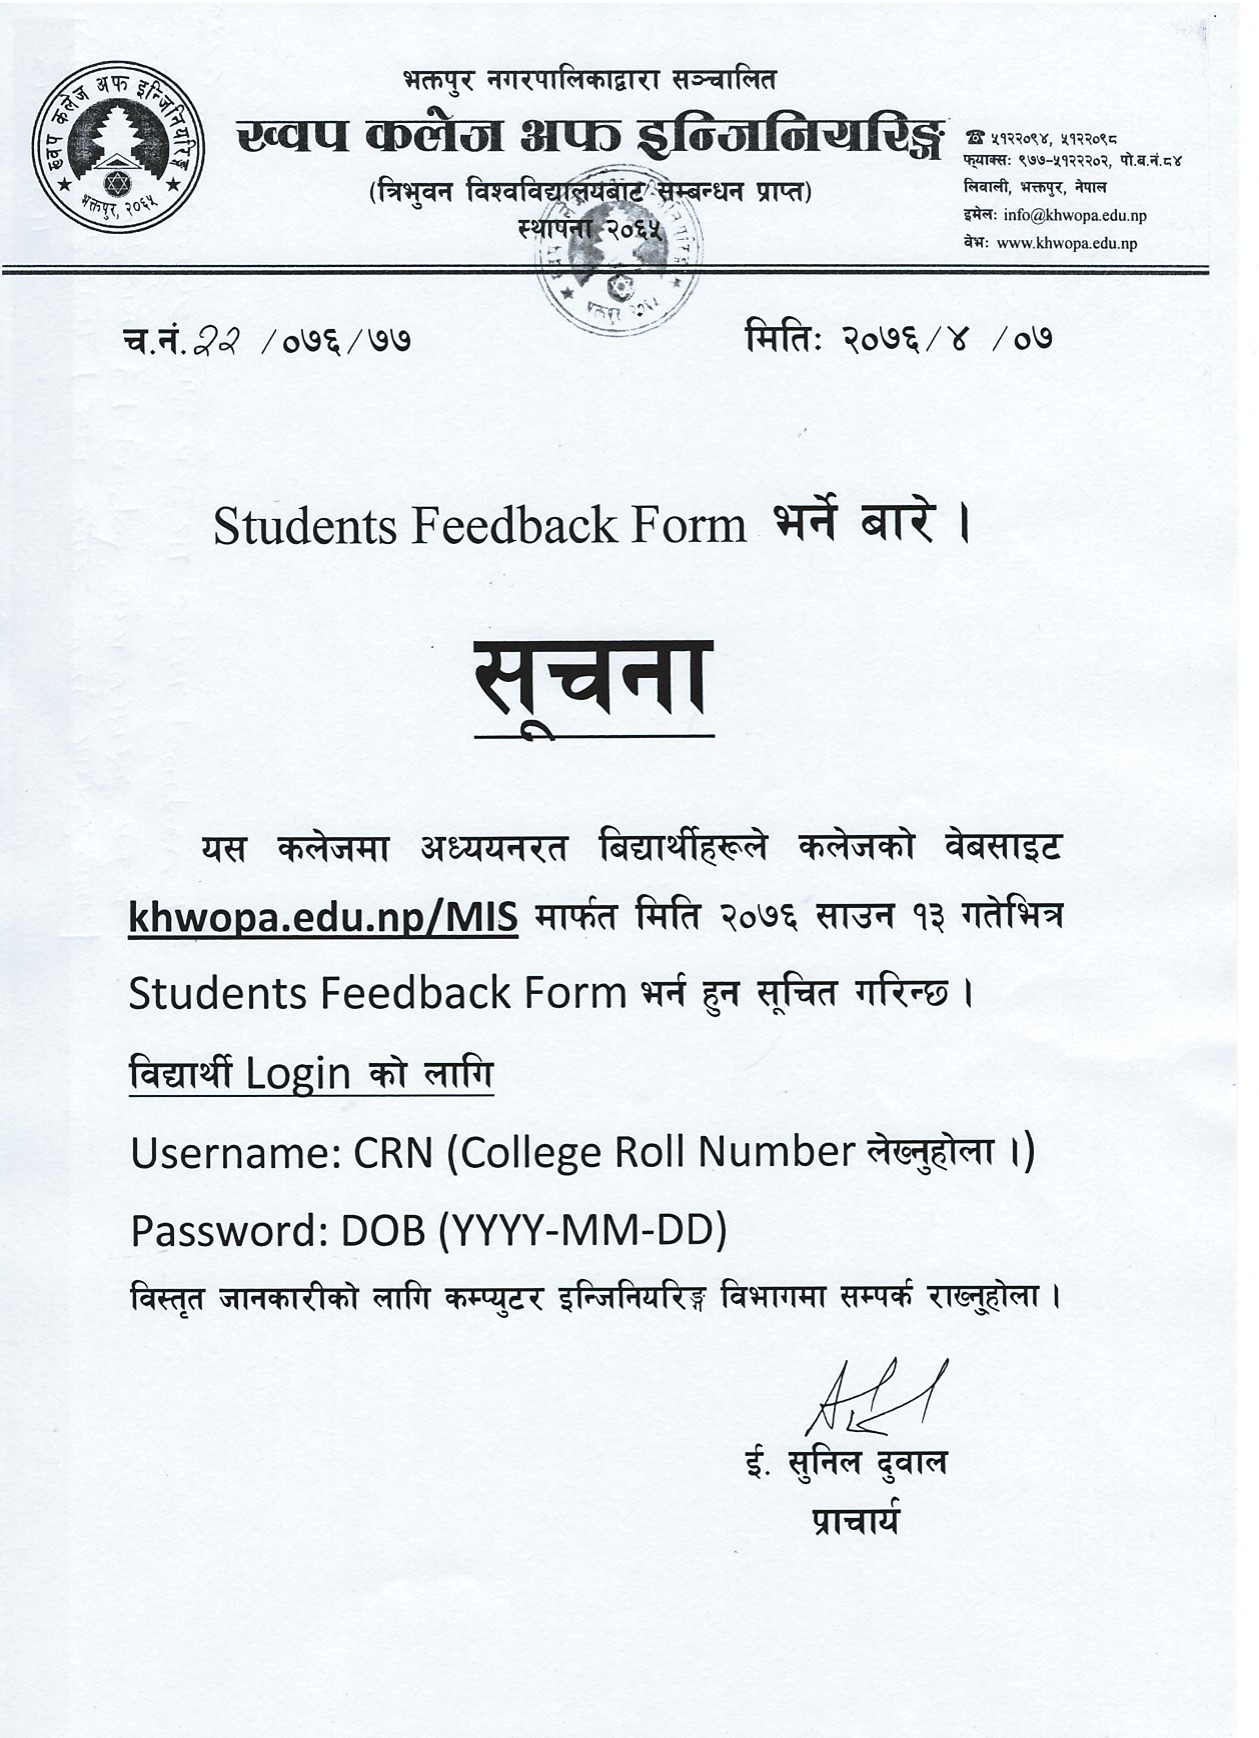 Students Feedback Form भर्ने बारे ।